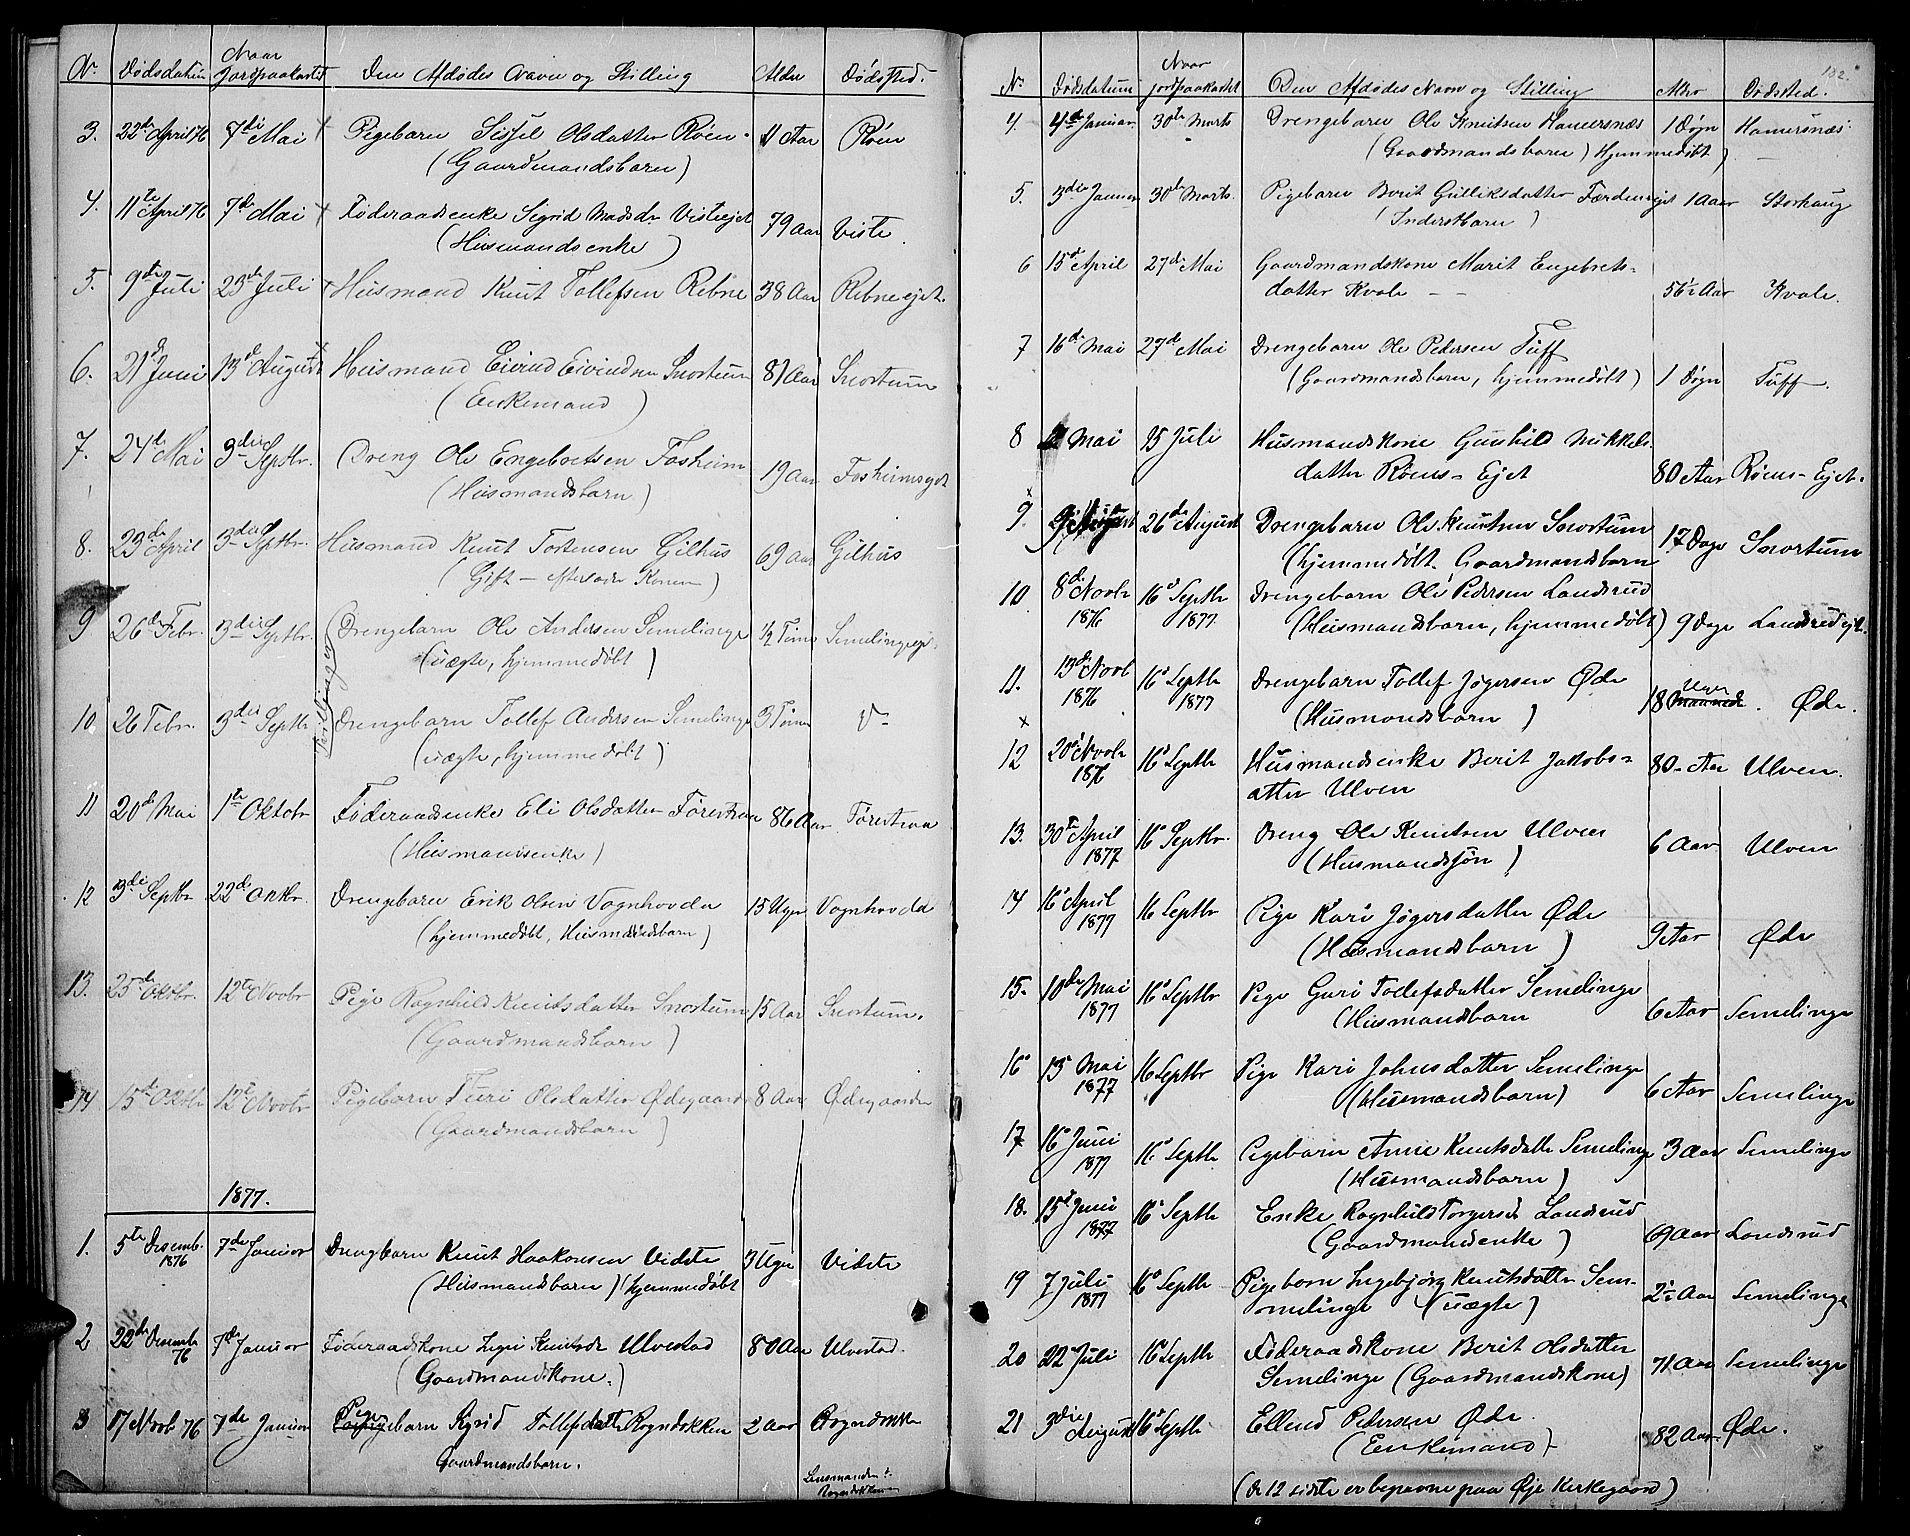 SAH, Vestre Slidre prestekontor, Klokkerbok nr. 3, 1869-1882, s. 132